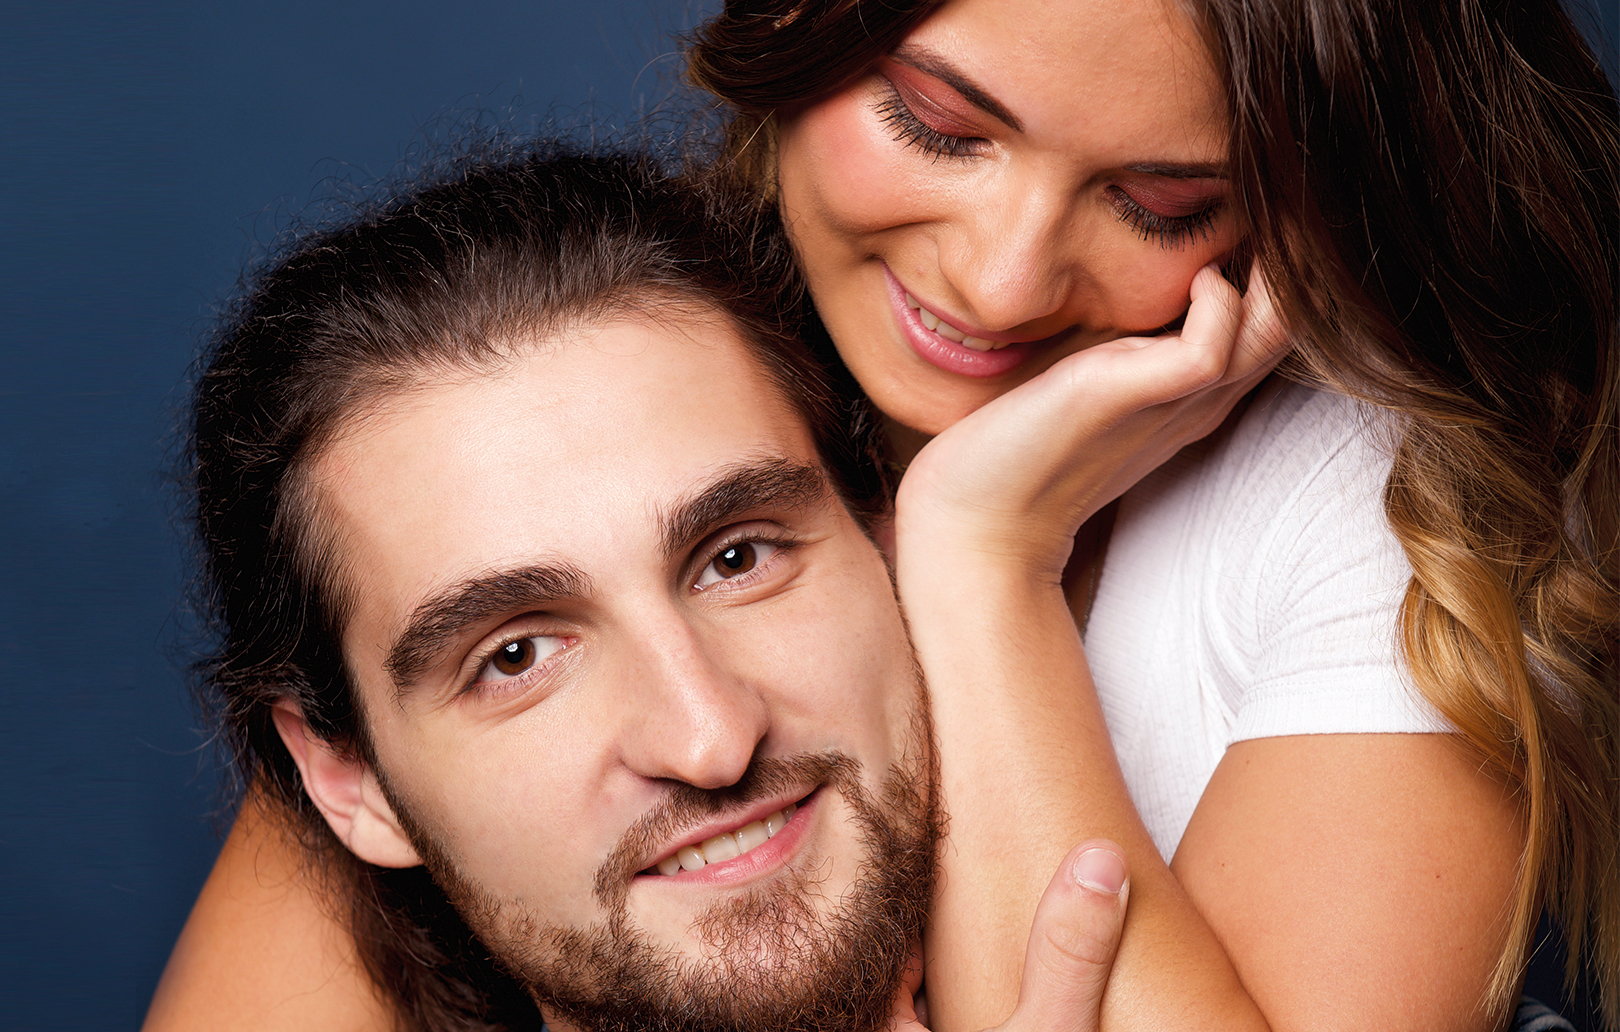 partner-fotoshooting-passau-bg41618472924